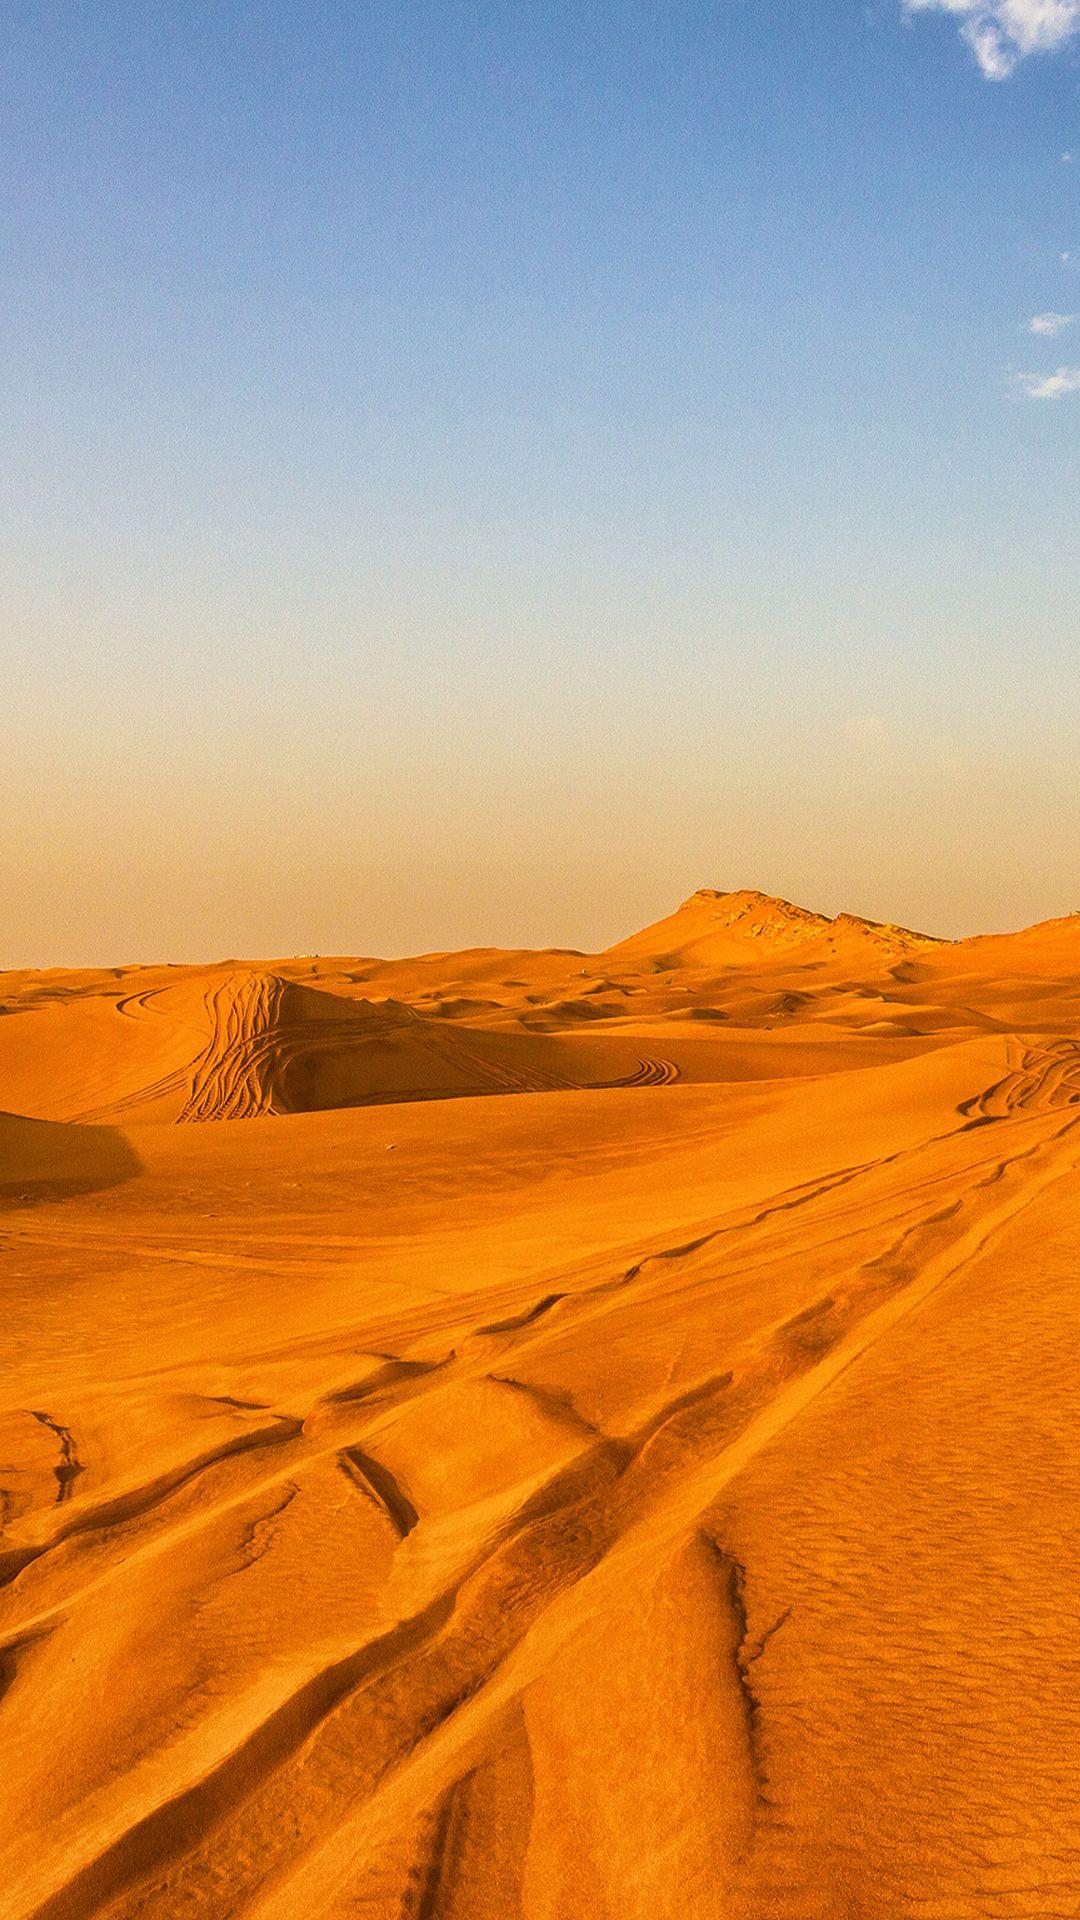 Pure Nature Golden Desert Landscape Iphone 6 Wallpaper Download Iphone Wallpapers Ipad Wallpapers One Stop Download Landscape Iphone 6 Wallpaper Nature